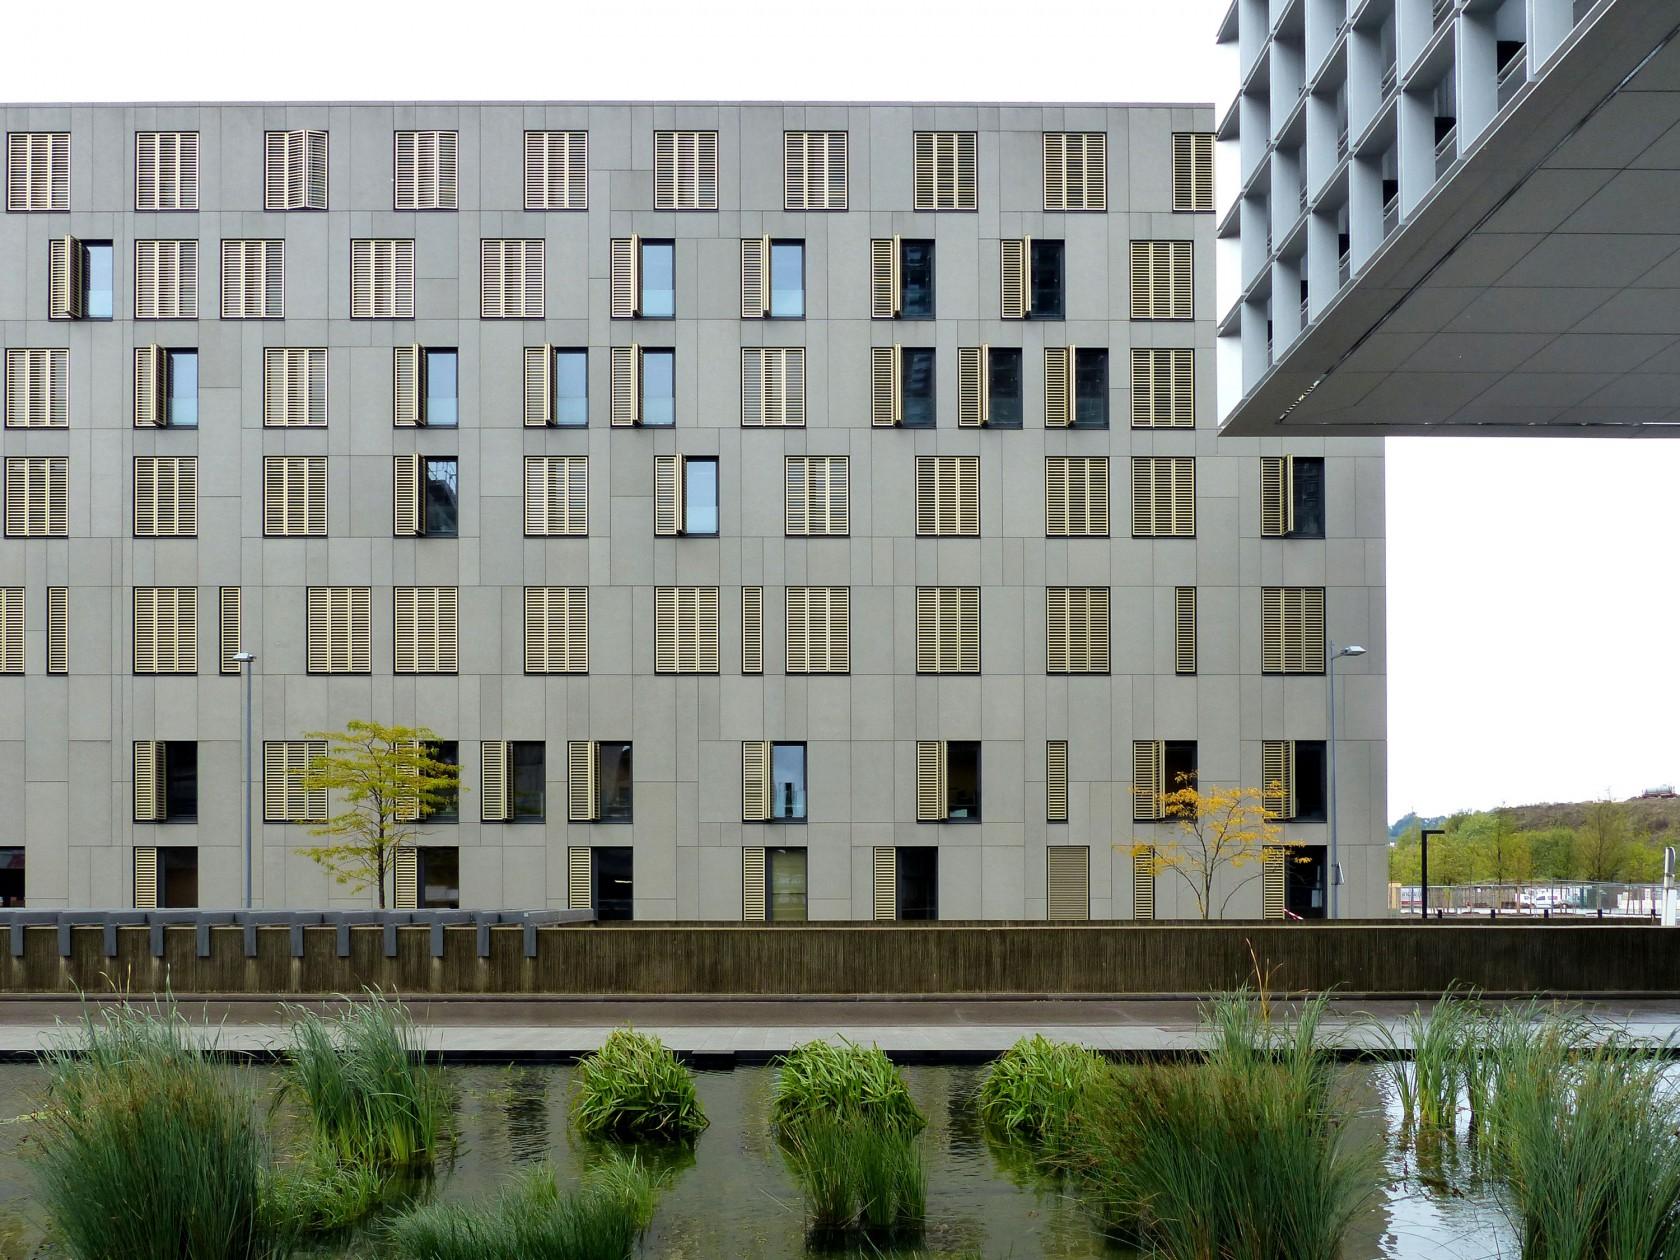 Abscis Architecten - Zuidgevel - fotografie Abscis Architecten